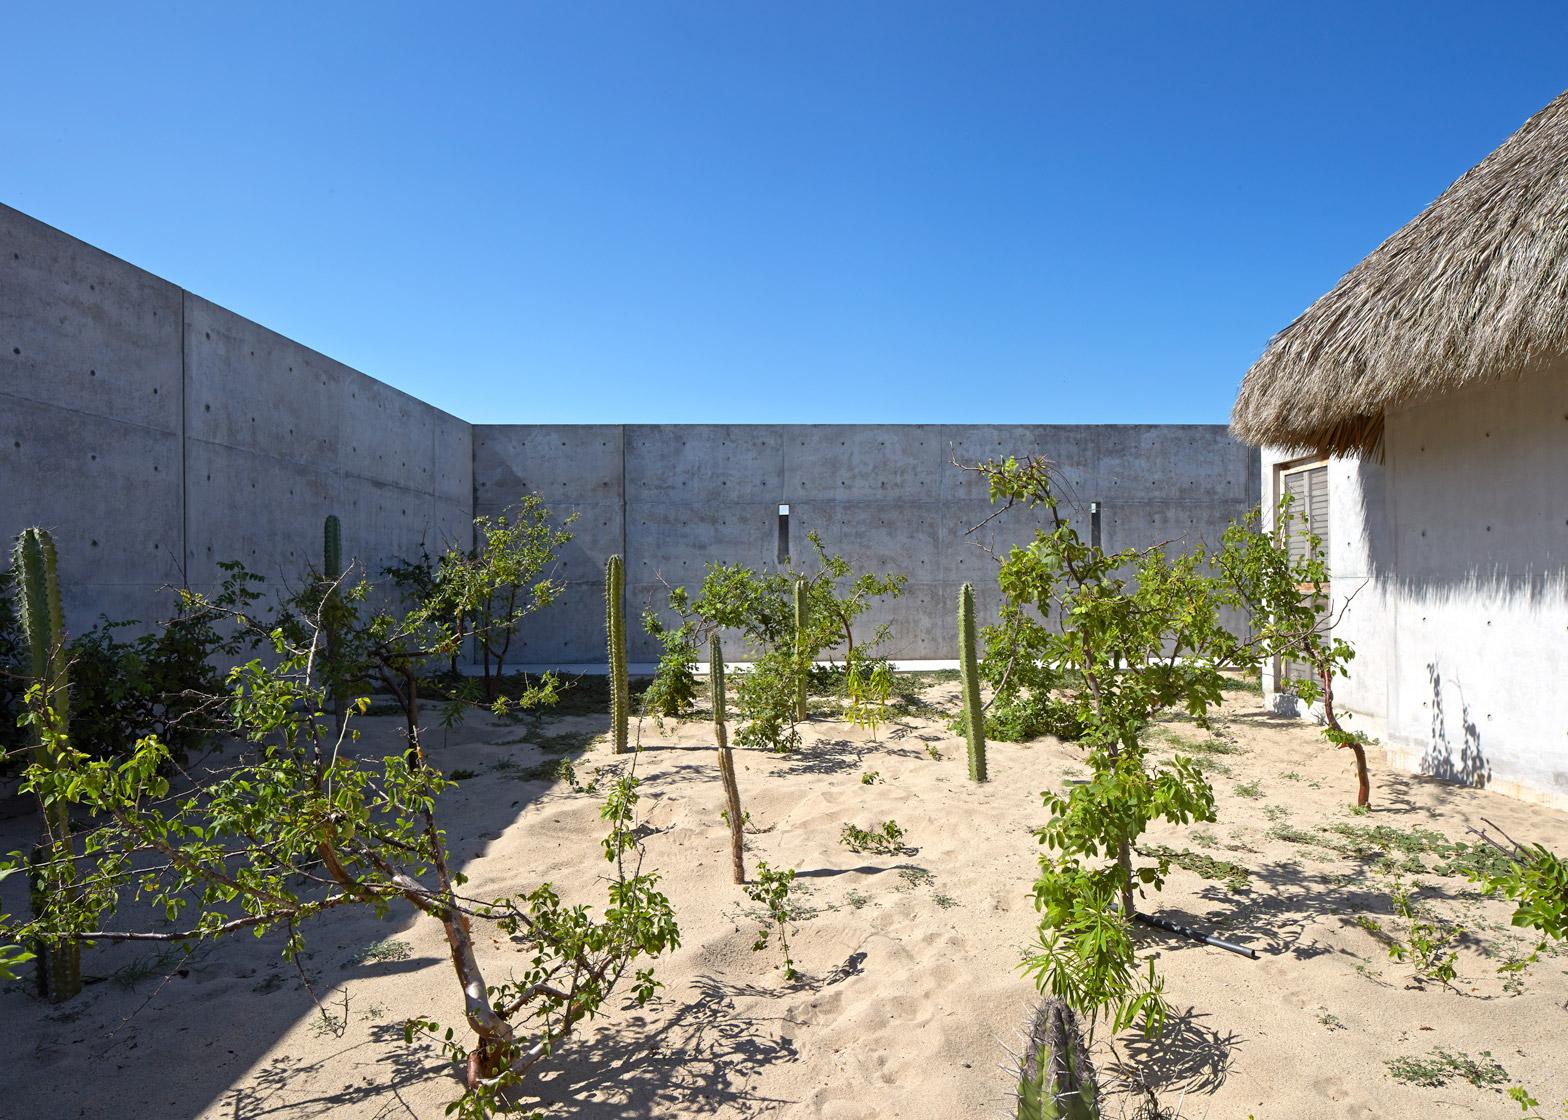 Casa-Wabi_Bosco-Studio-House_Tadao-Ando_Puerto-Escondido_Oaxaca_Mexico_dezeen_1568_1.jpg